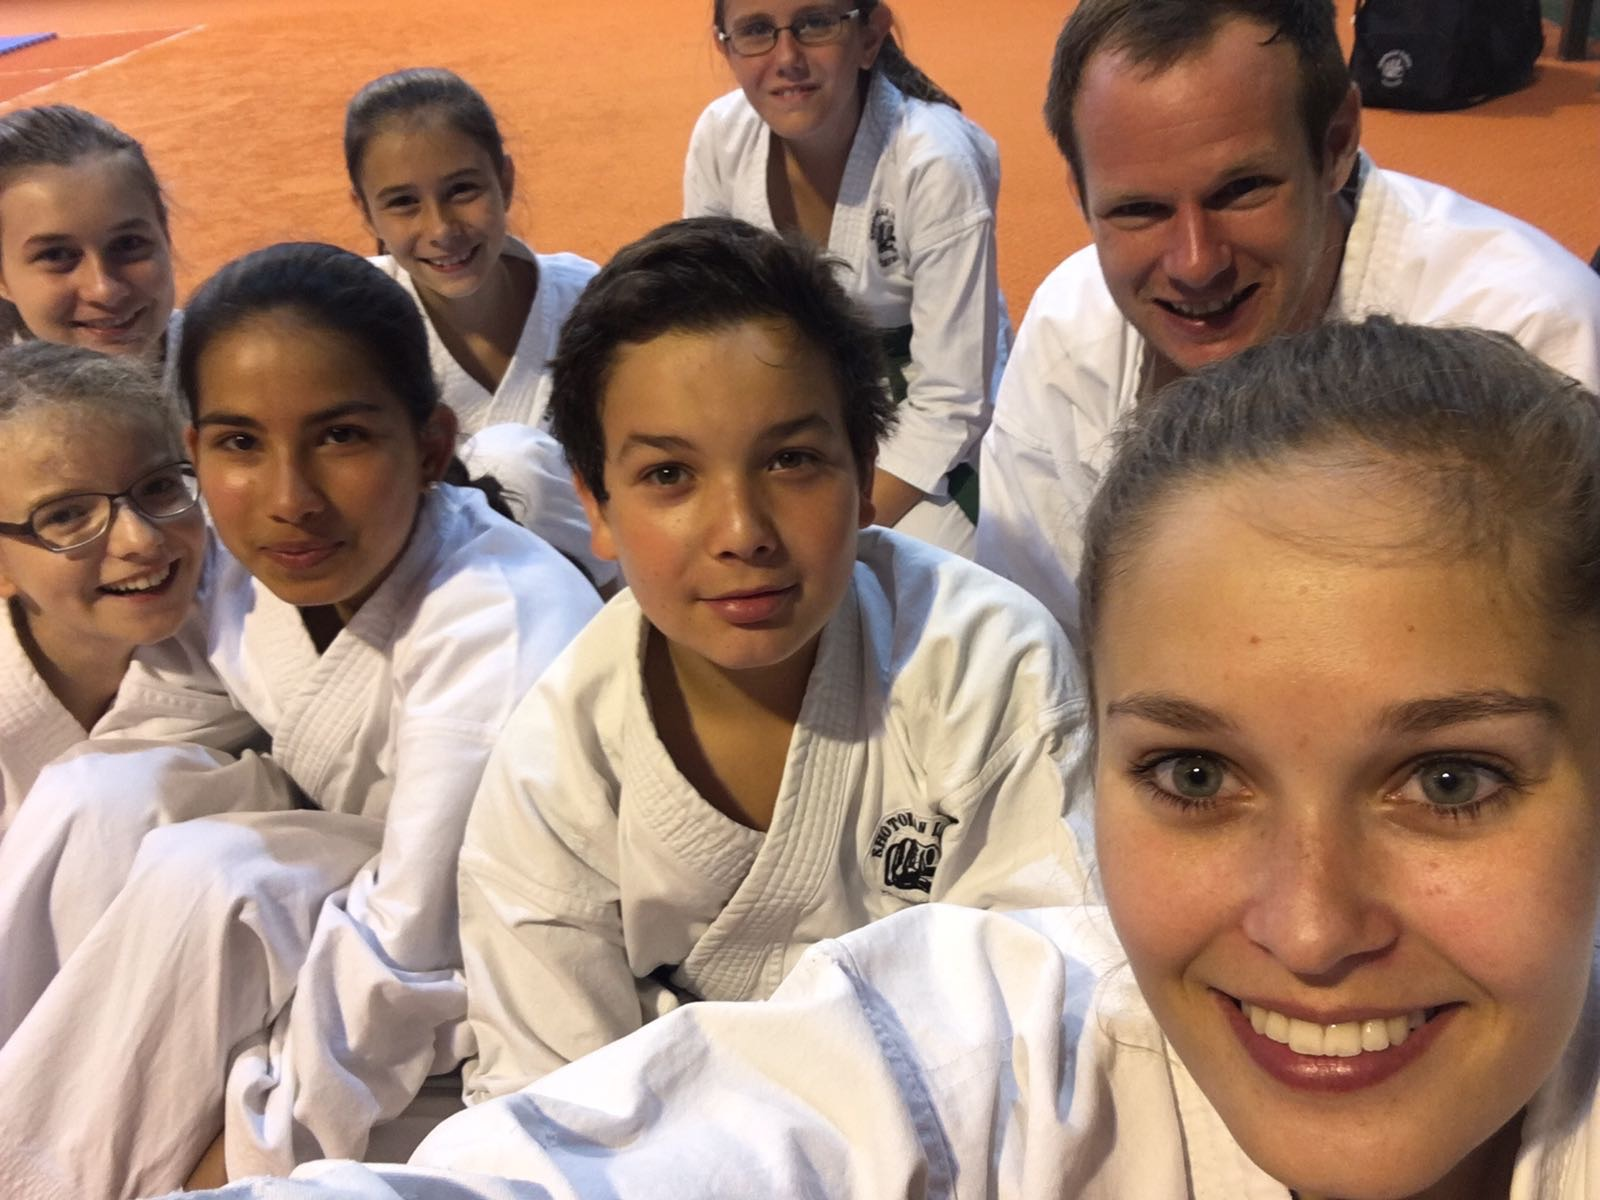 Shotokan Karate Club Feldkirch Kindertraining Schnappschuss